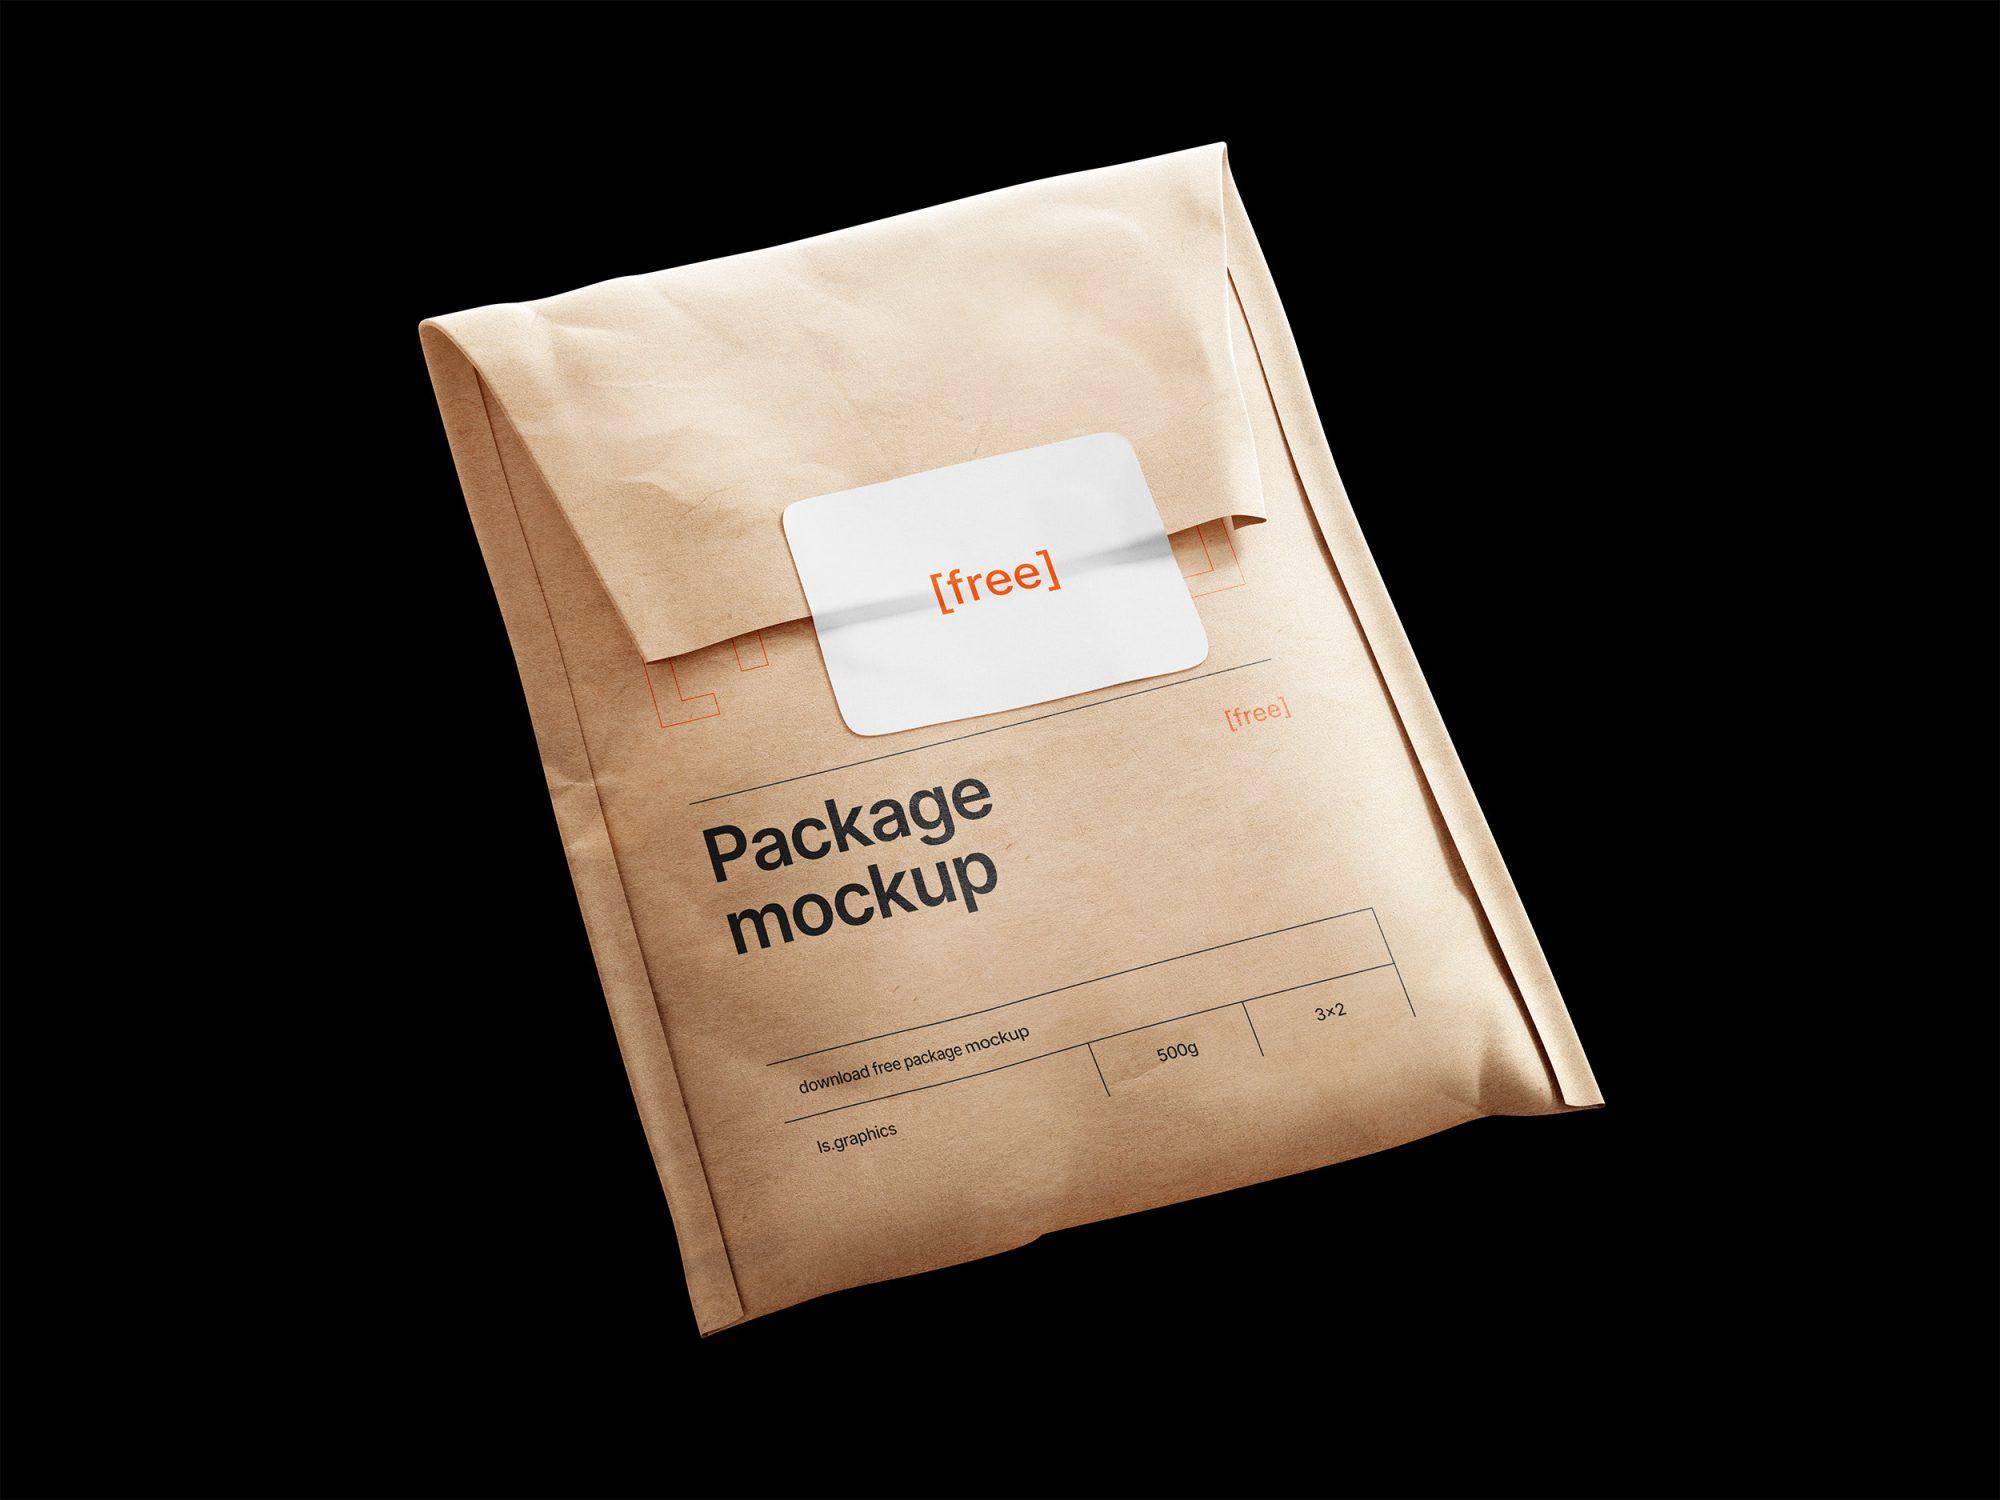 free paper bag envelope mockup